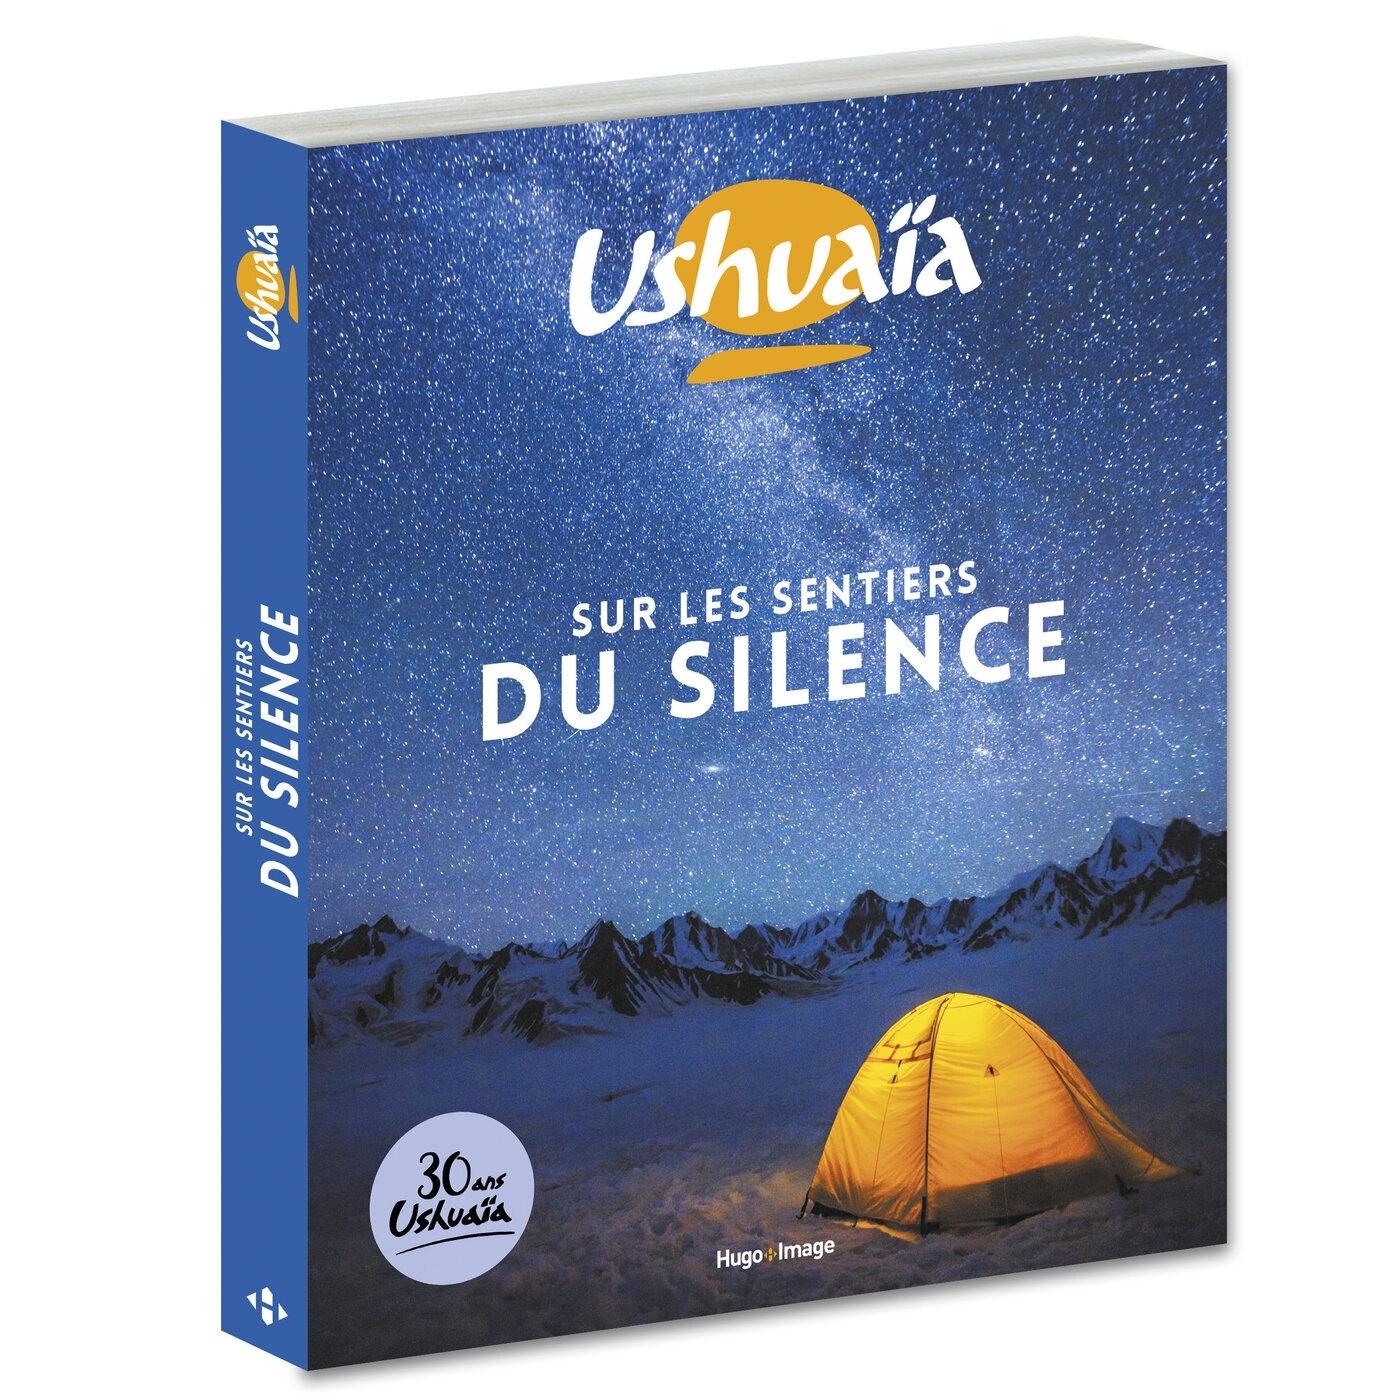 USHUAIA SUR LES SENTIERS DU SILENCE - 30 ANS USHUAIA